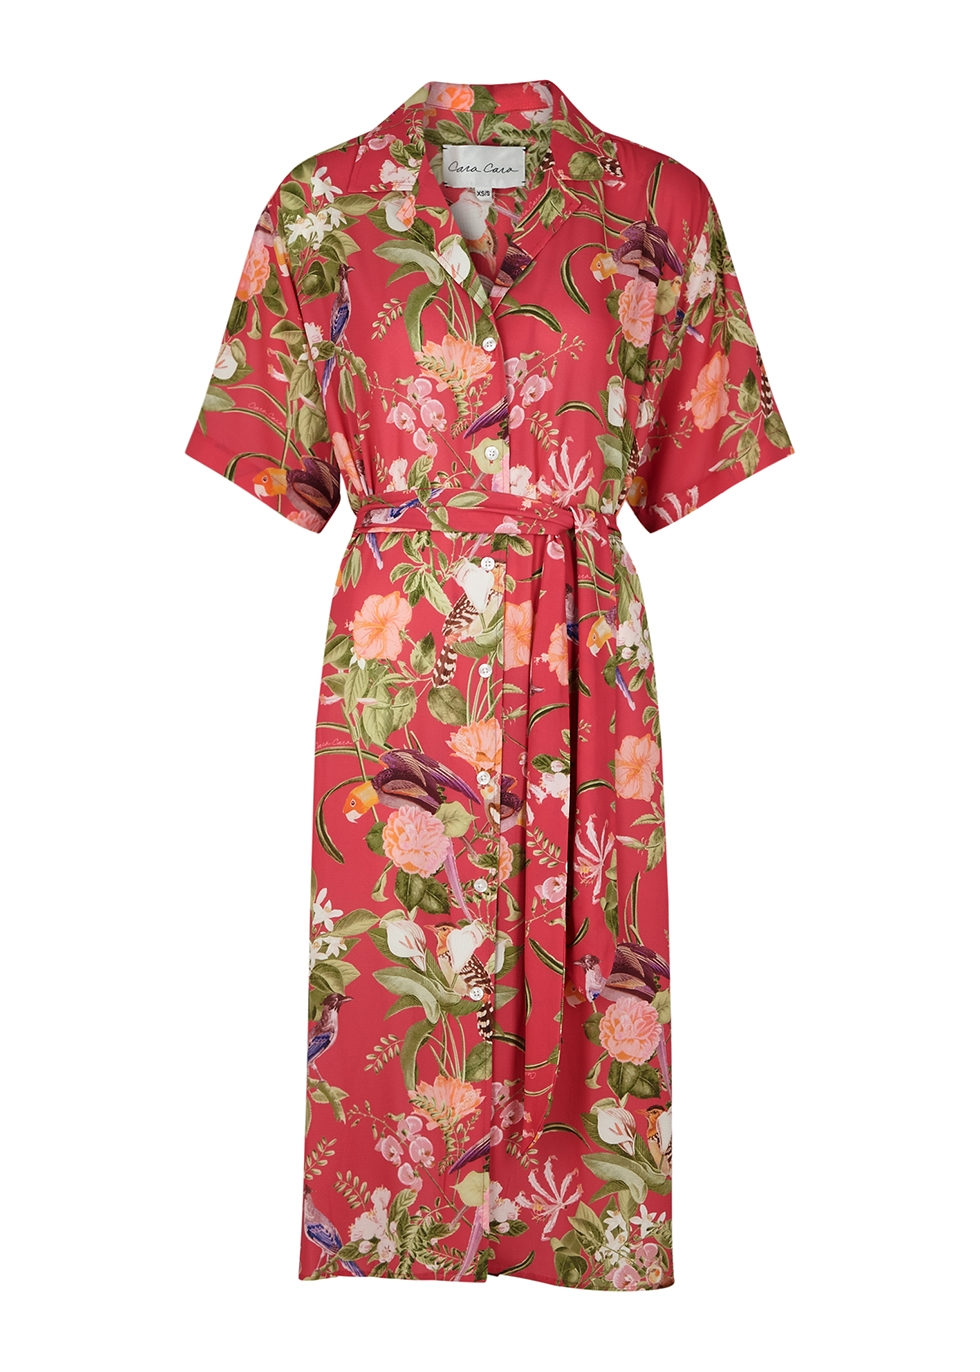 Hobbs printed shirt dress